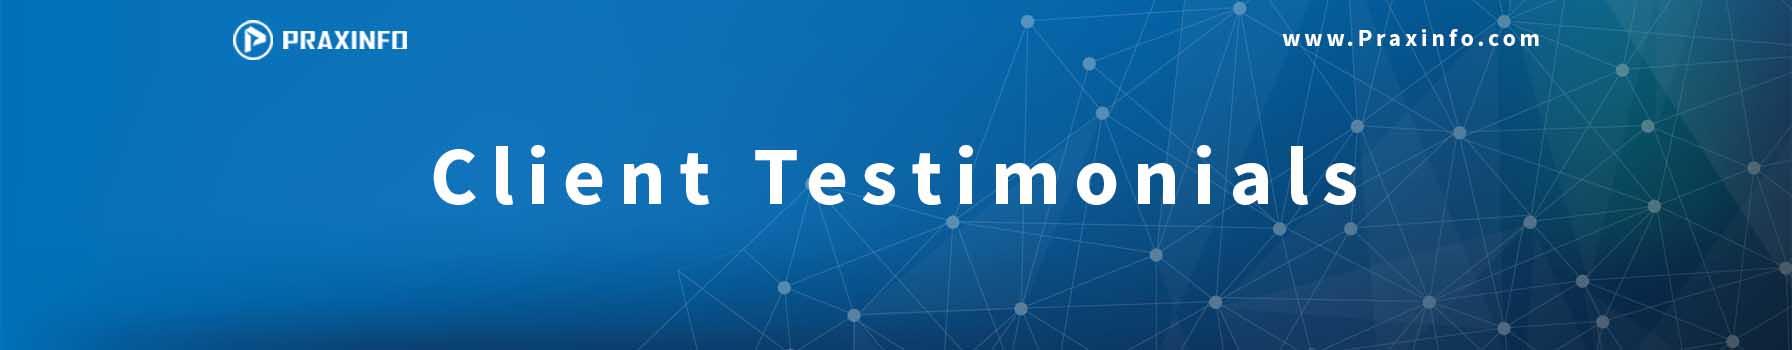 client-testimonials-1.jpg